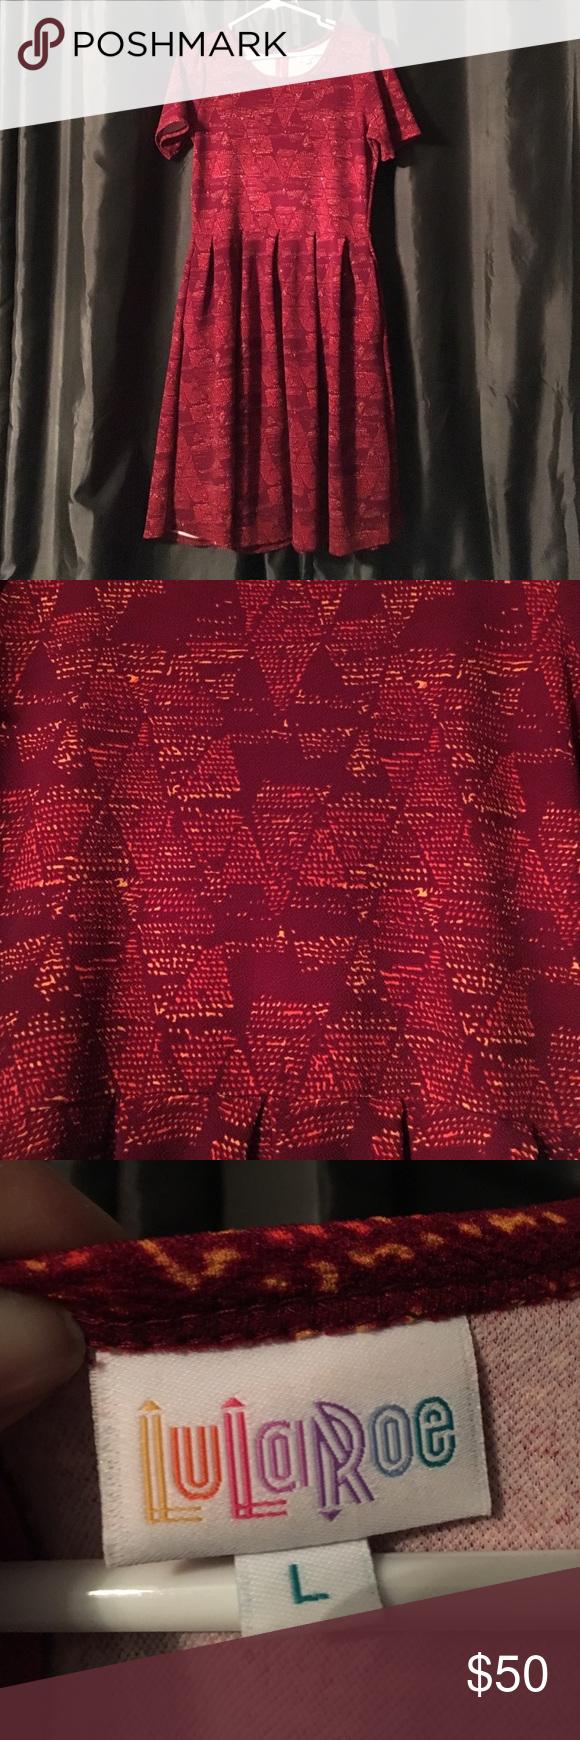 🦄 Lularoe Amelia!!! Beautiful Lularoe Amelia!!! Gorgeous red with orange and yellow tone design. So comfy!!! Has zipper back and two pockets!! Worn once. LuLaRoe Dresses